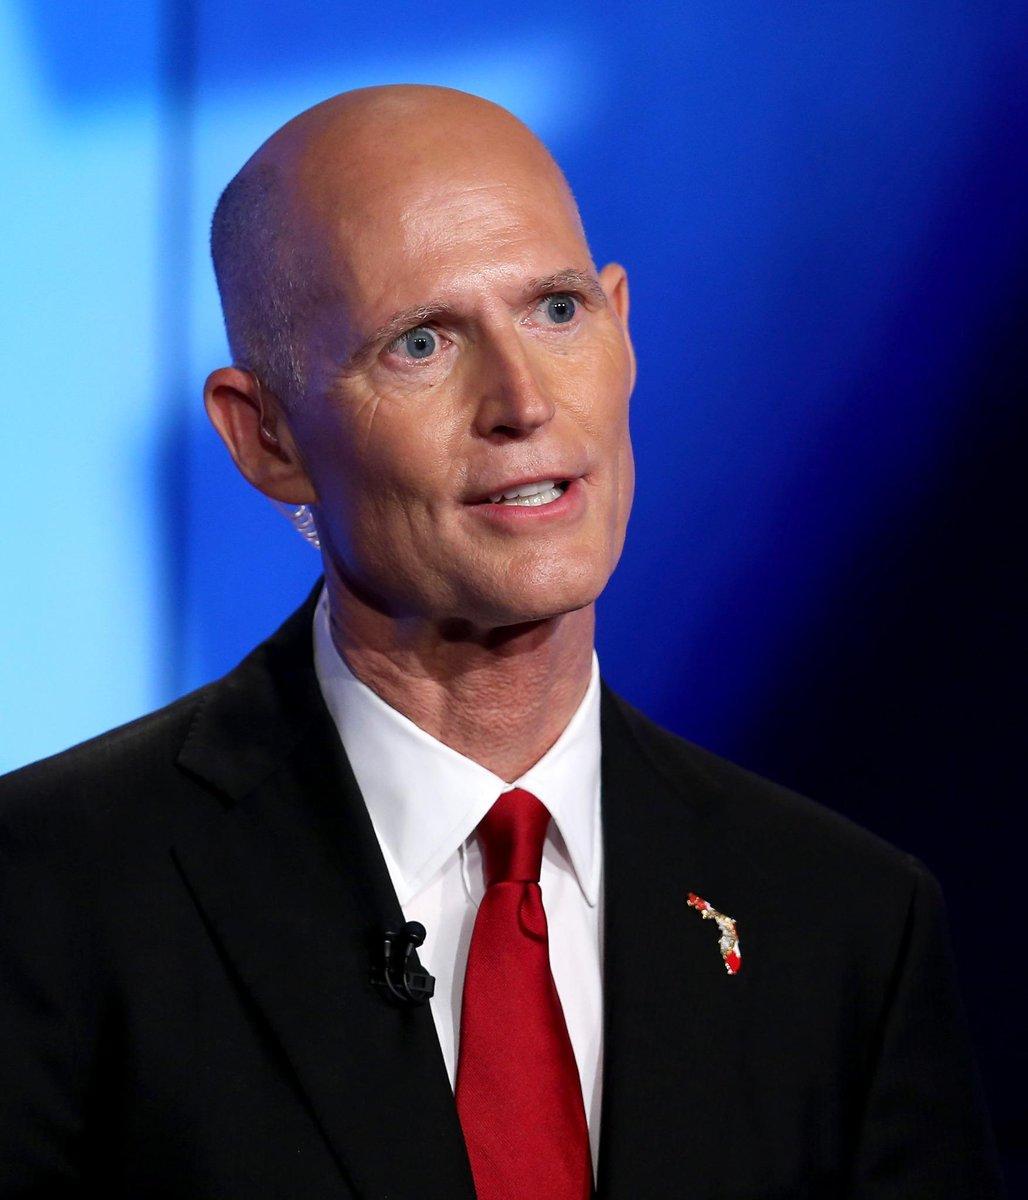 #BREAKING IT'S OFFICIAL: #RickScott has won the #Florida governor #Election2014 race http://t.co/b0RLJJs6OQ